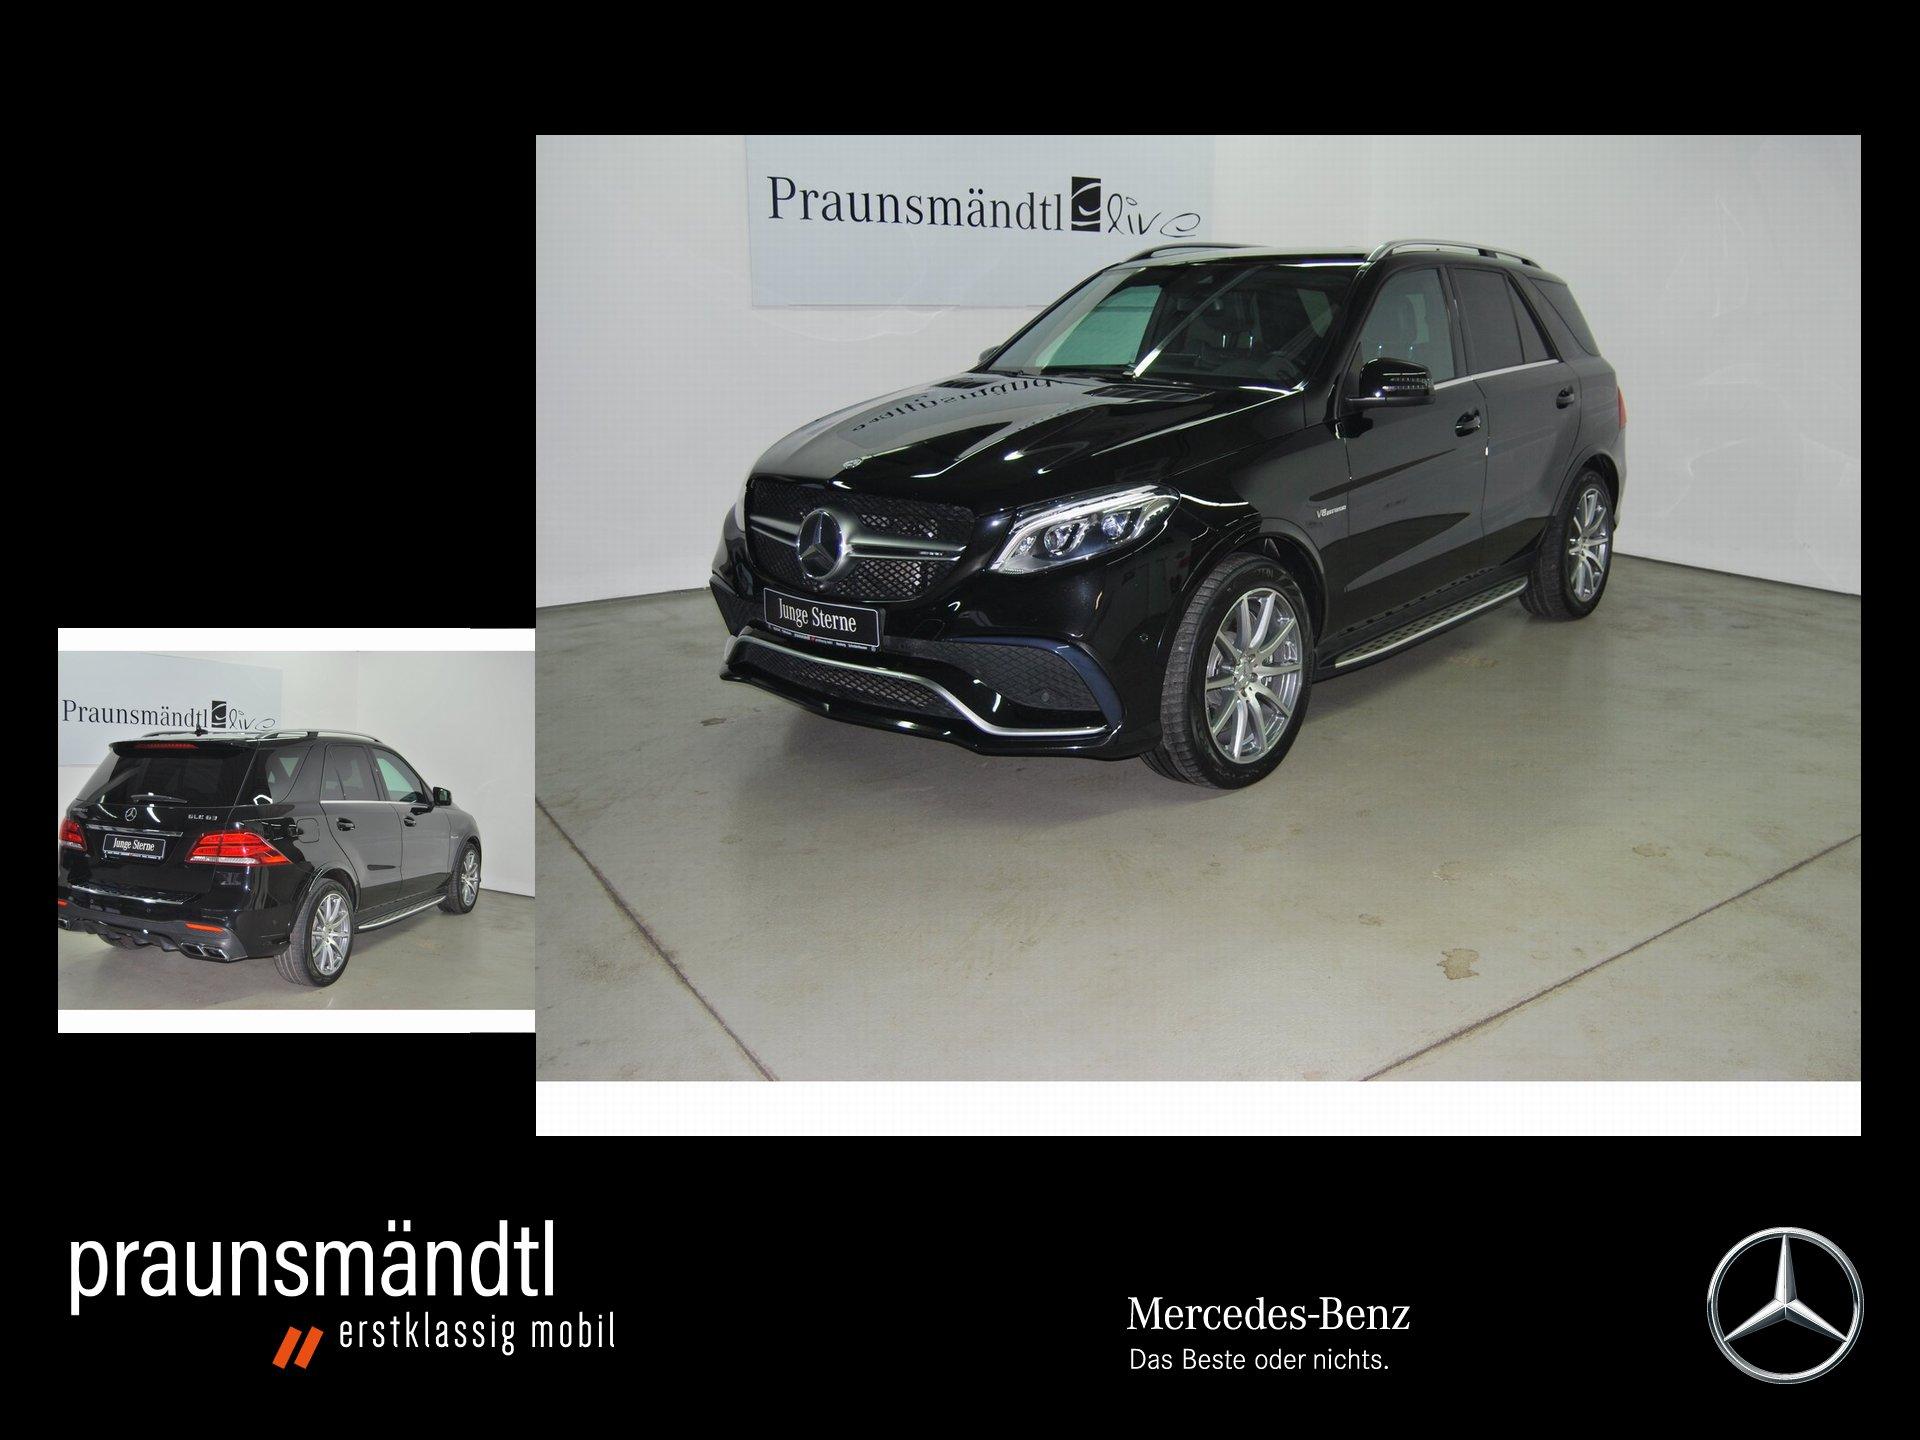 Mercedes-Benz GLE 63 AMG AIRMA/AHK/Com/360°/SHZFond/PerforAbga, Jahr 2015, Benzin